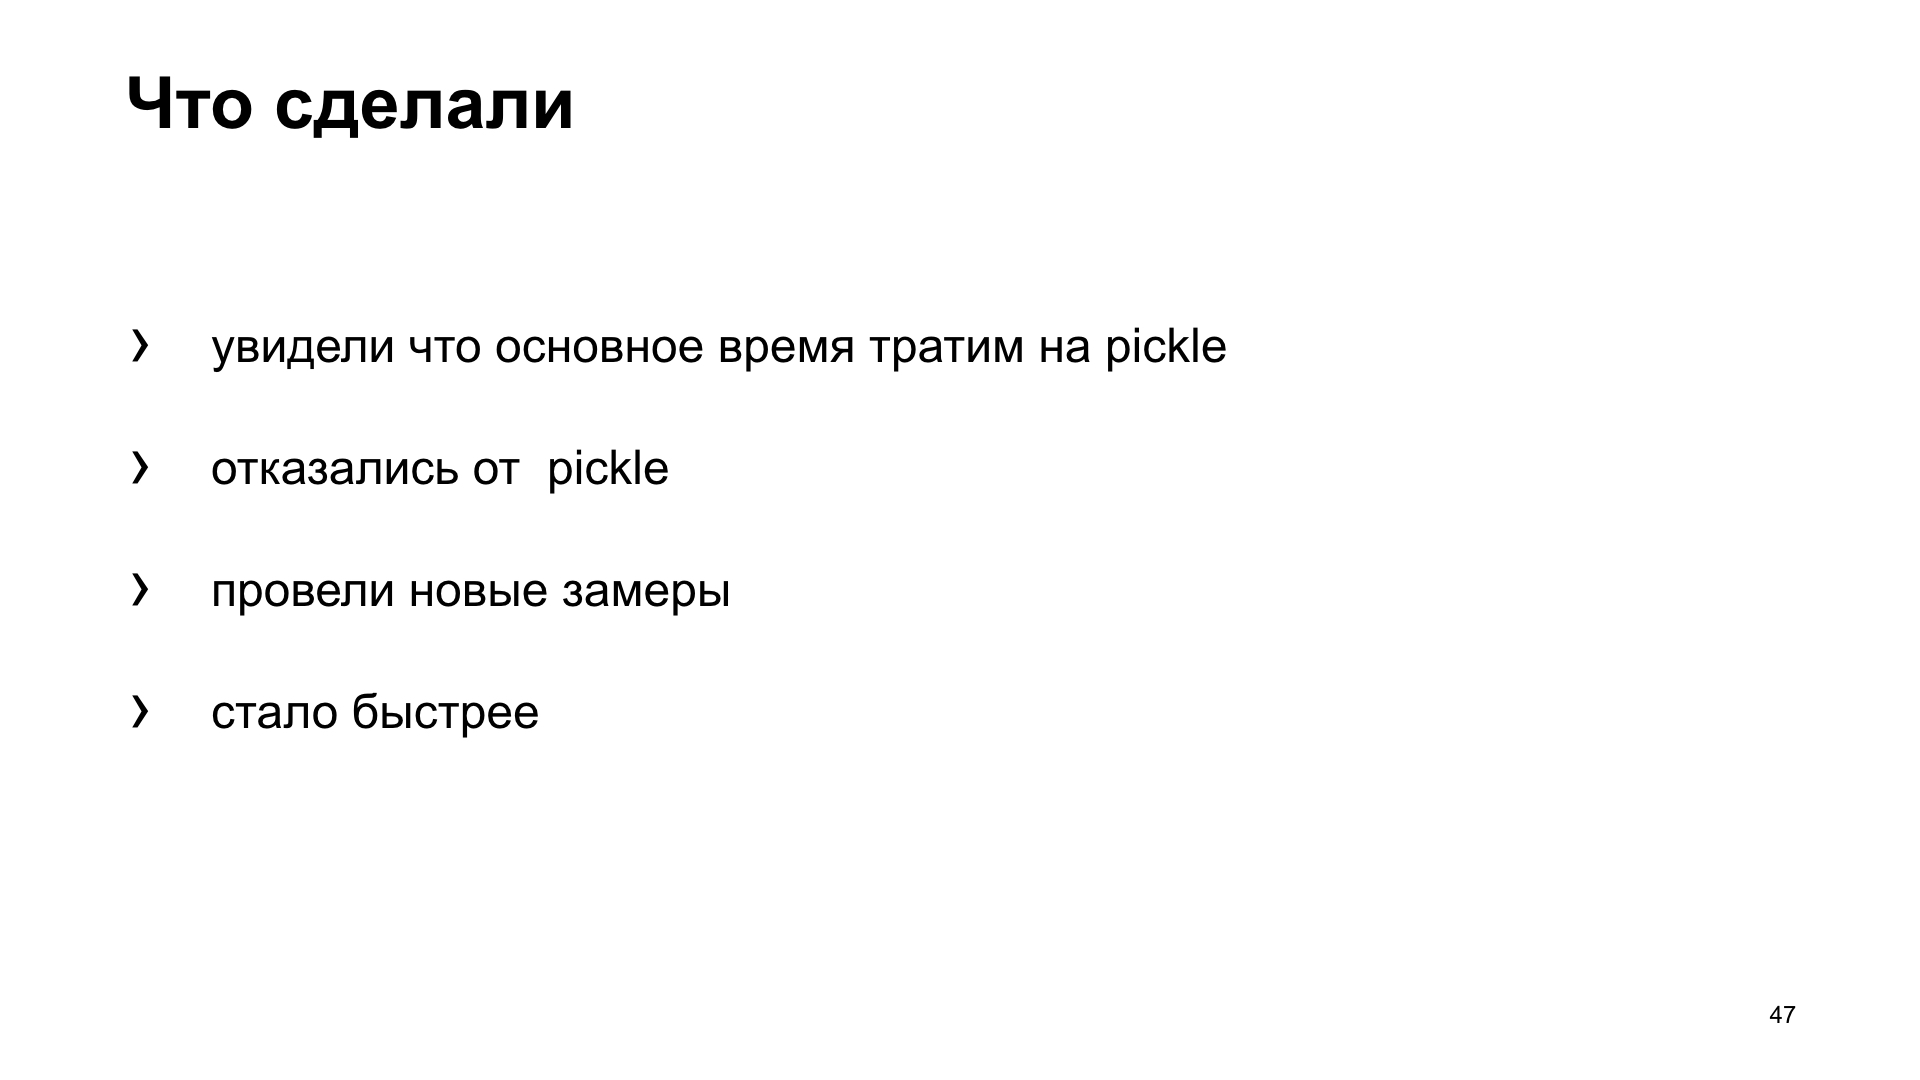 uWSGI в помощь метрикам. Доклад Яндекса - 37